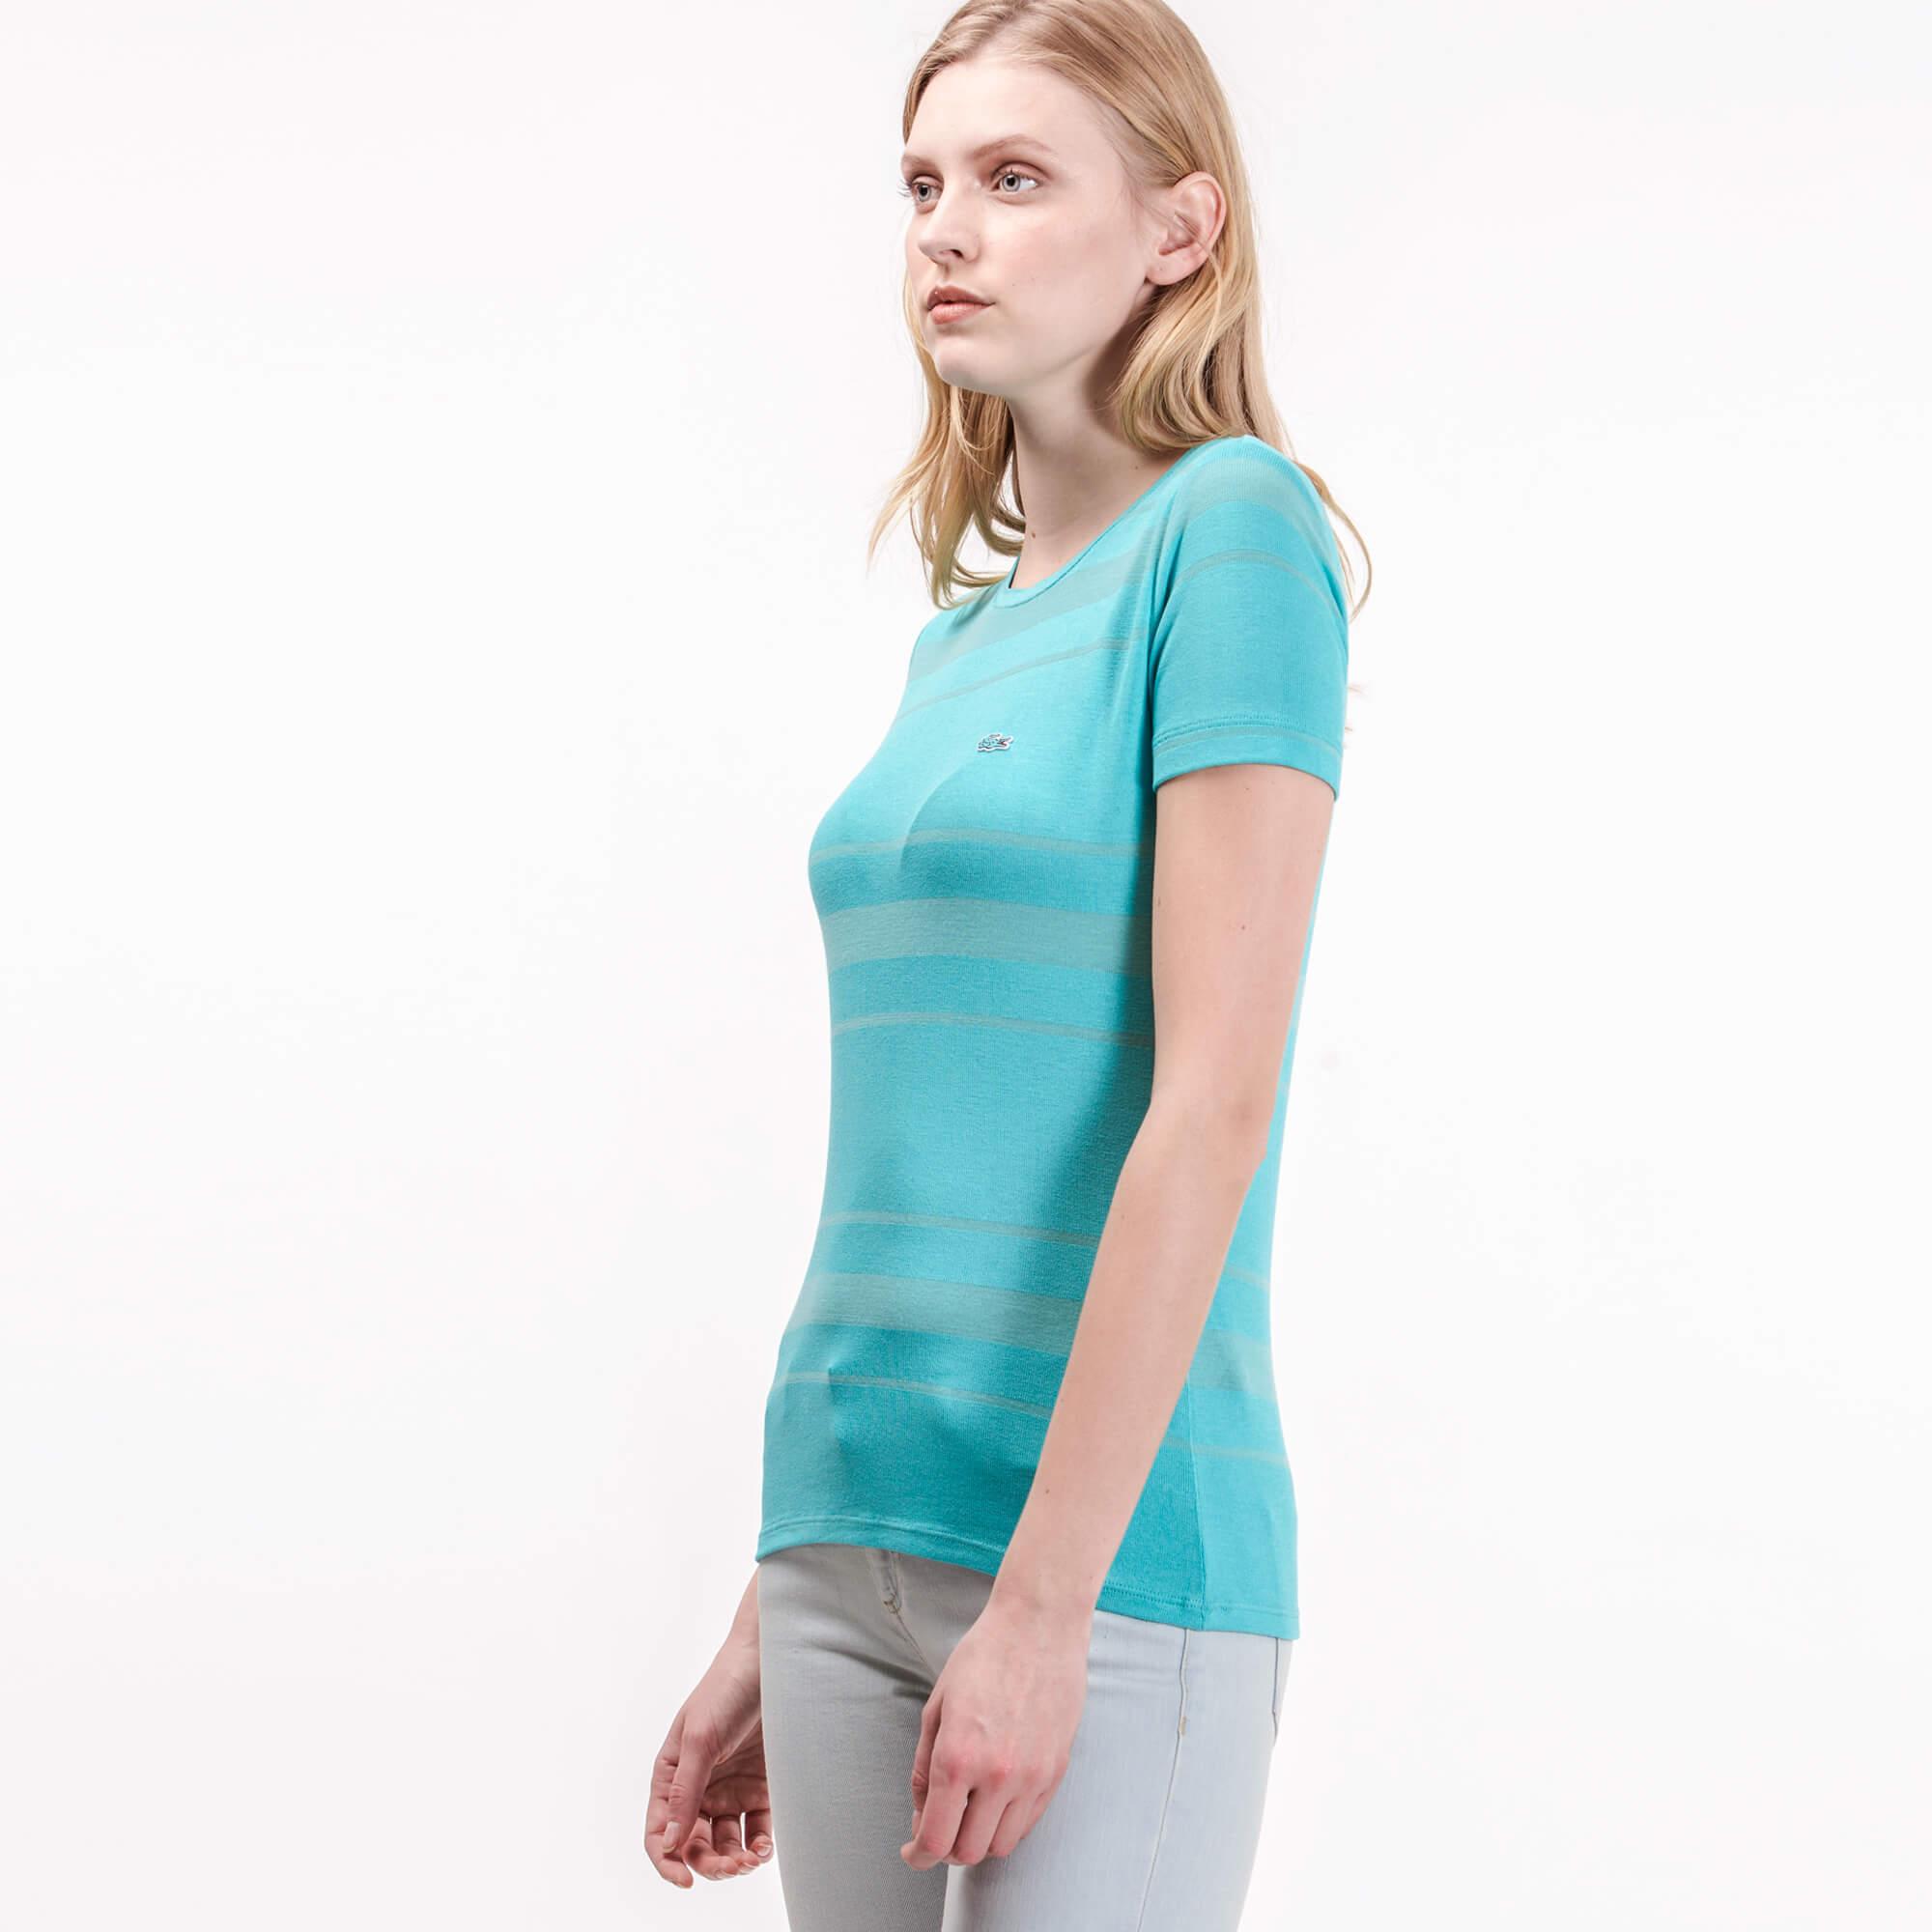 Lacoste Women's T-Shirt